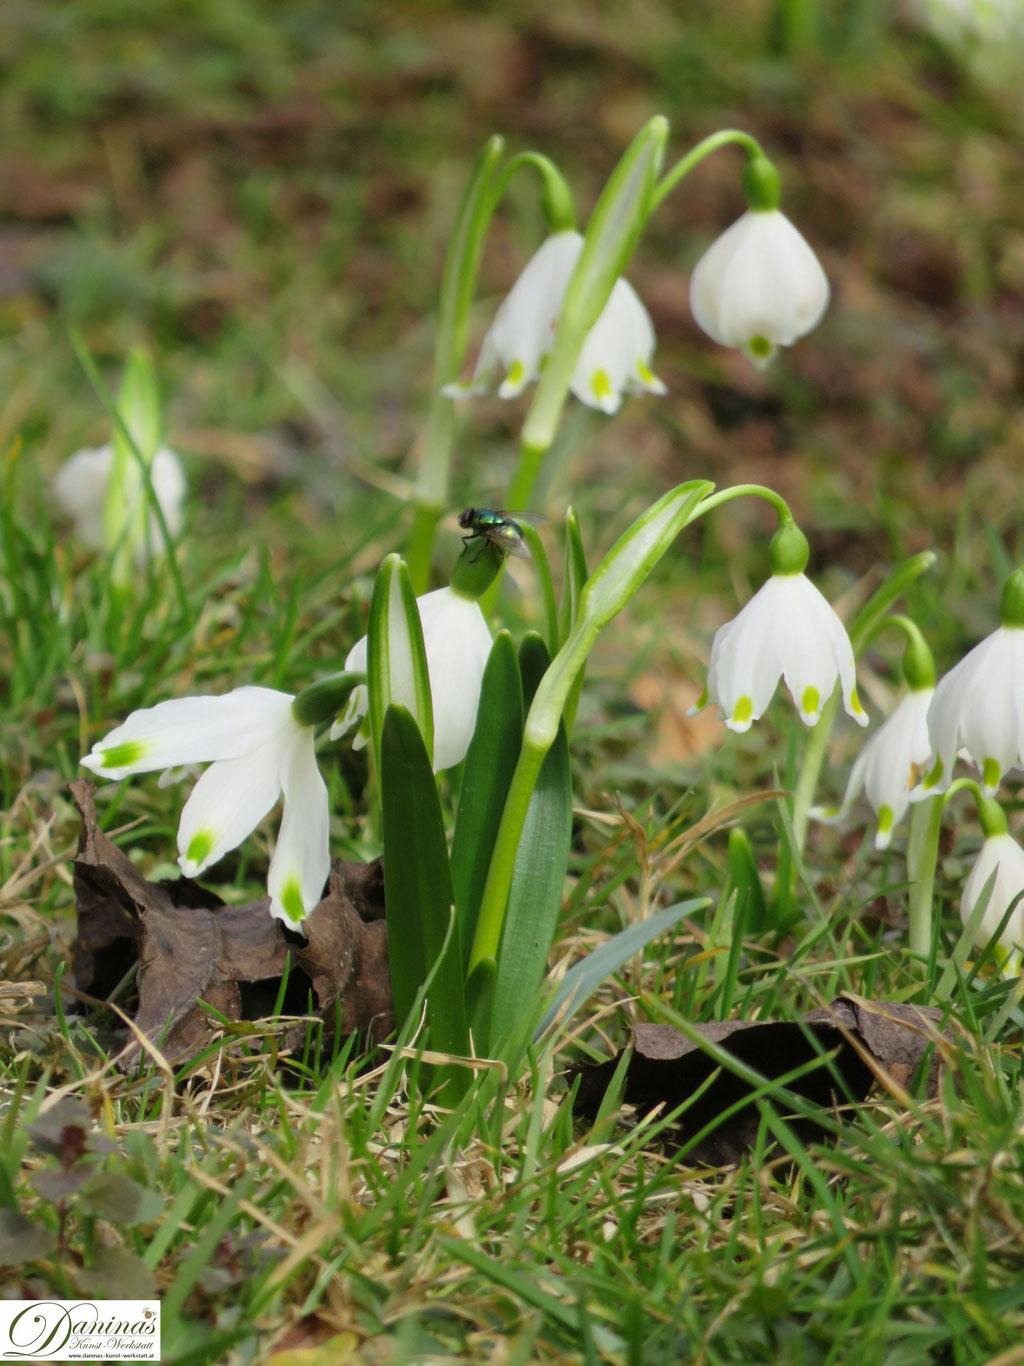 Frühlingsknotenblumen läuten den Frühling im Garten ein